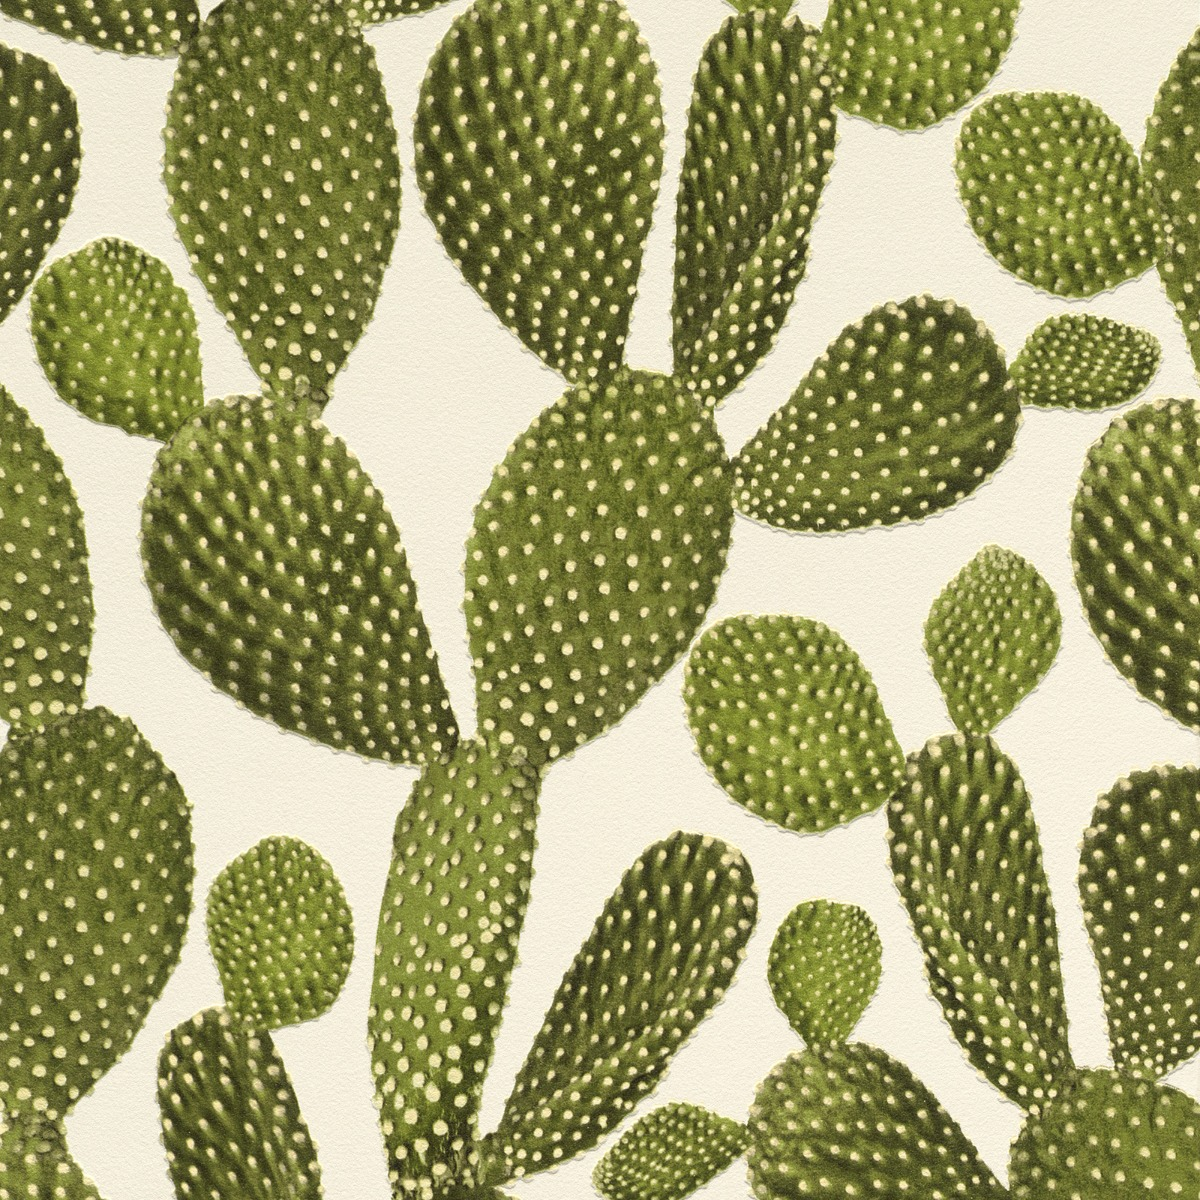 Cactus Wallpaper - Green and Cream - Rasch 441000